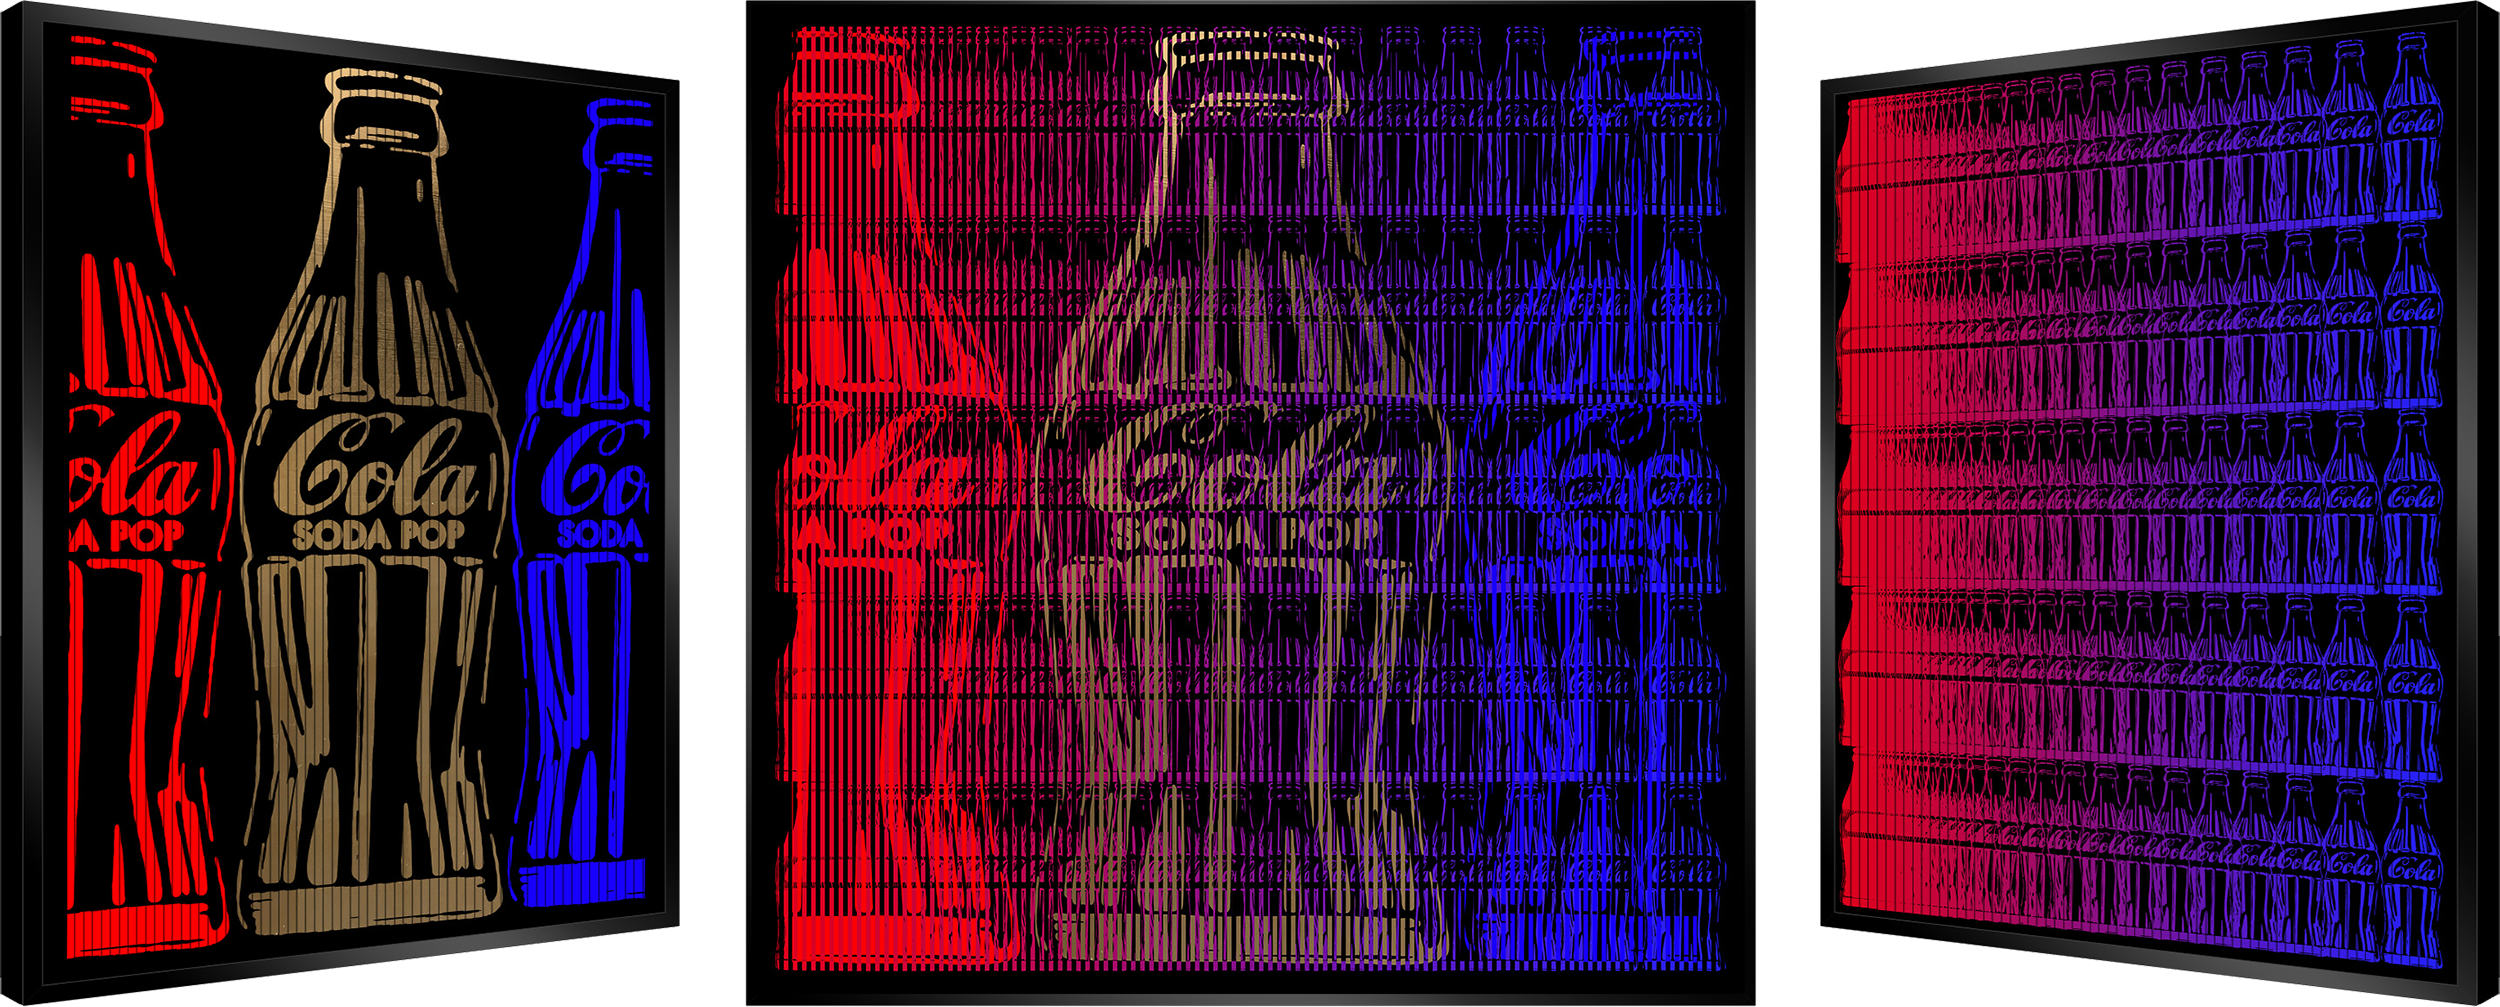 Patrick Rubinstein - Cola Infinity , 2624-012-220